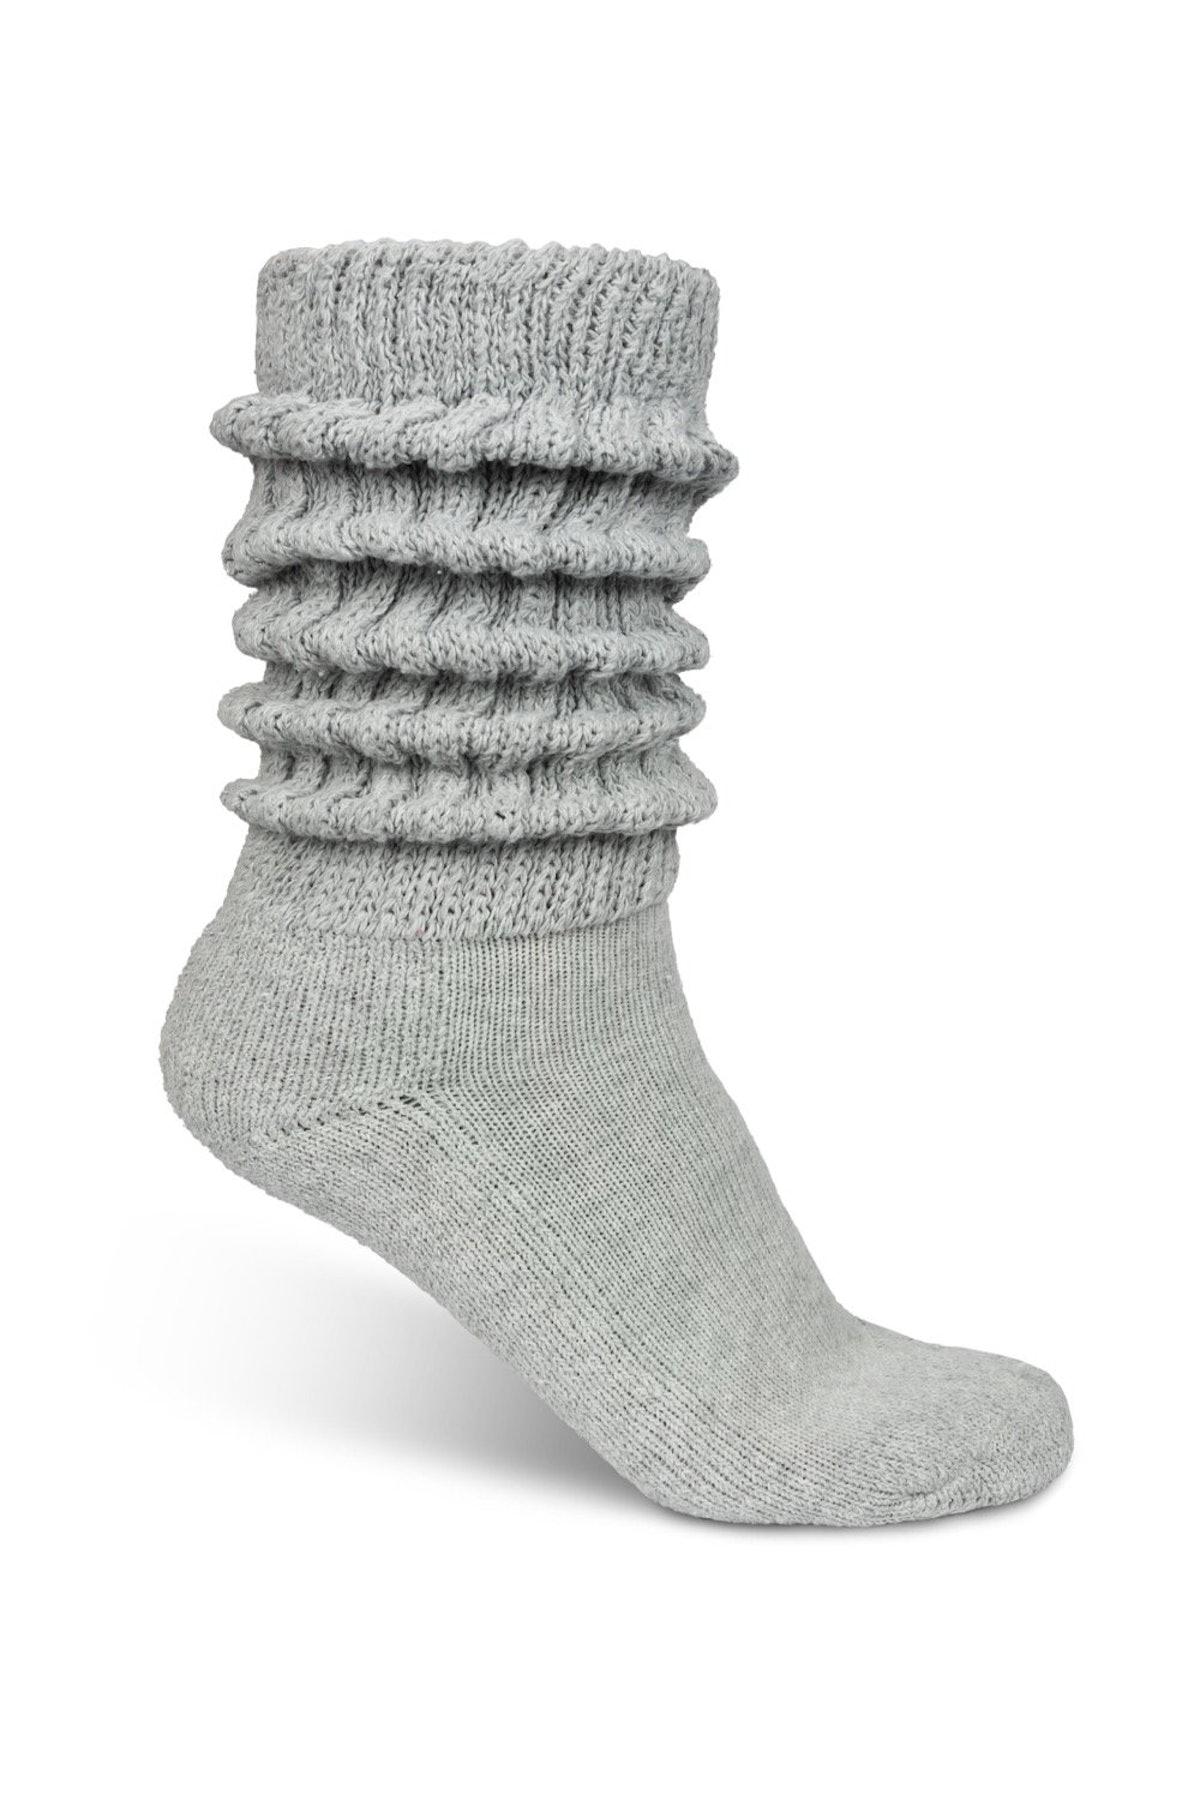 Cloud Sock